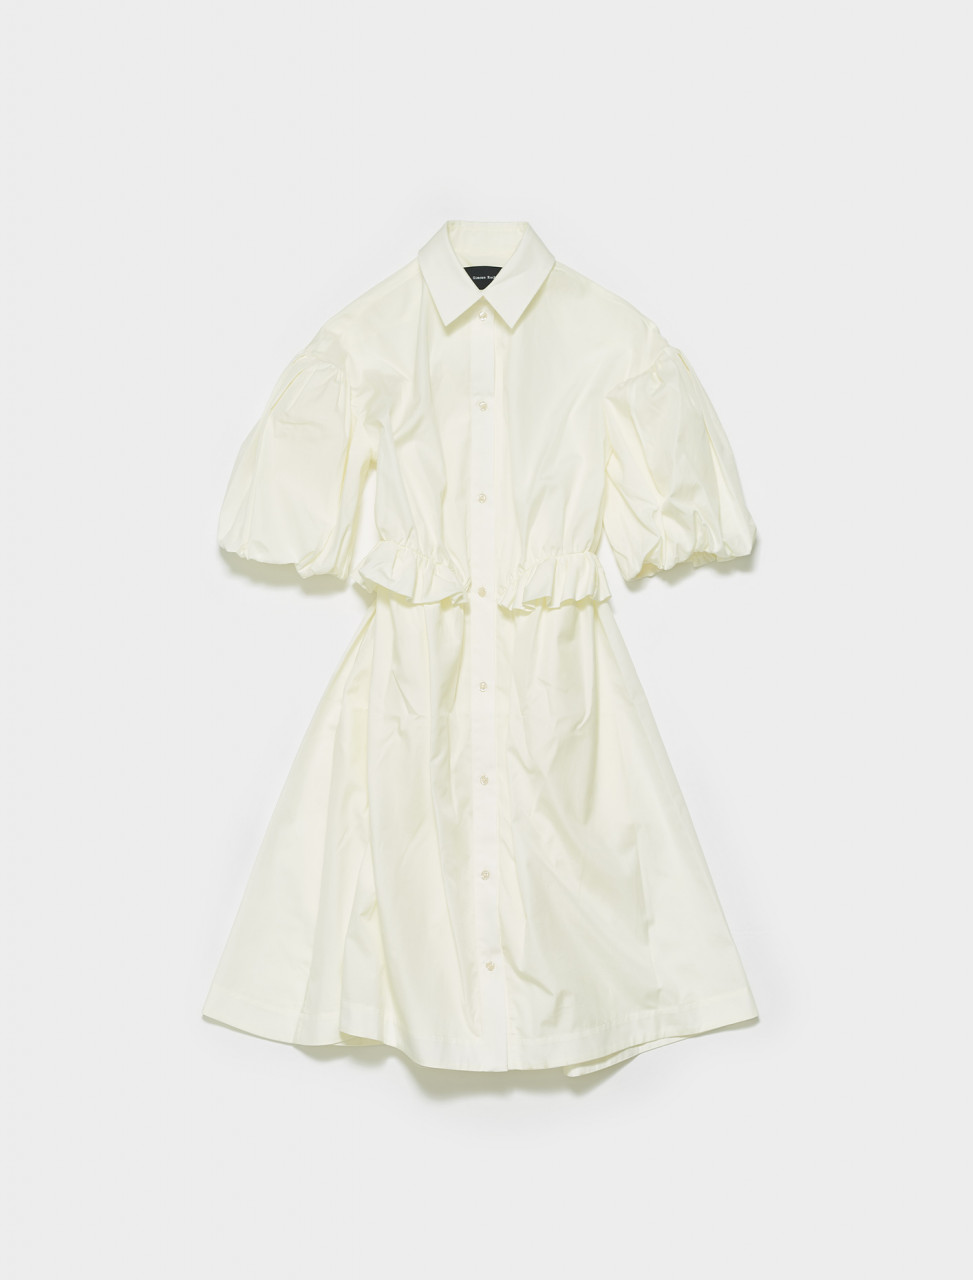 7060-0109 SIMONE ROCHA TWISTED HIP SHIRT DRESS